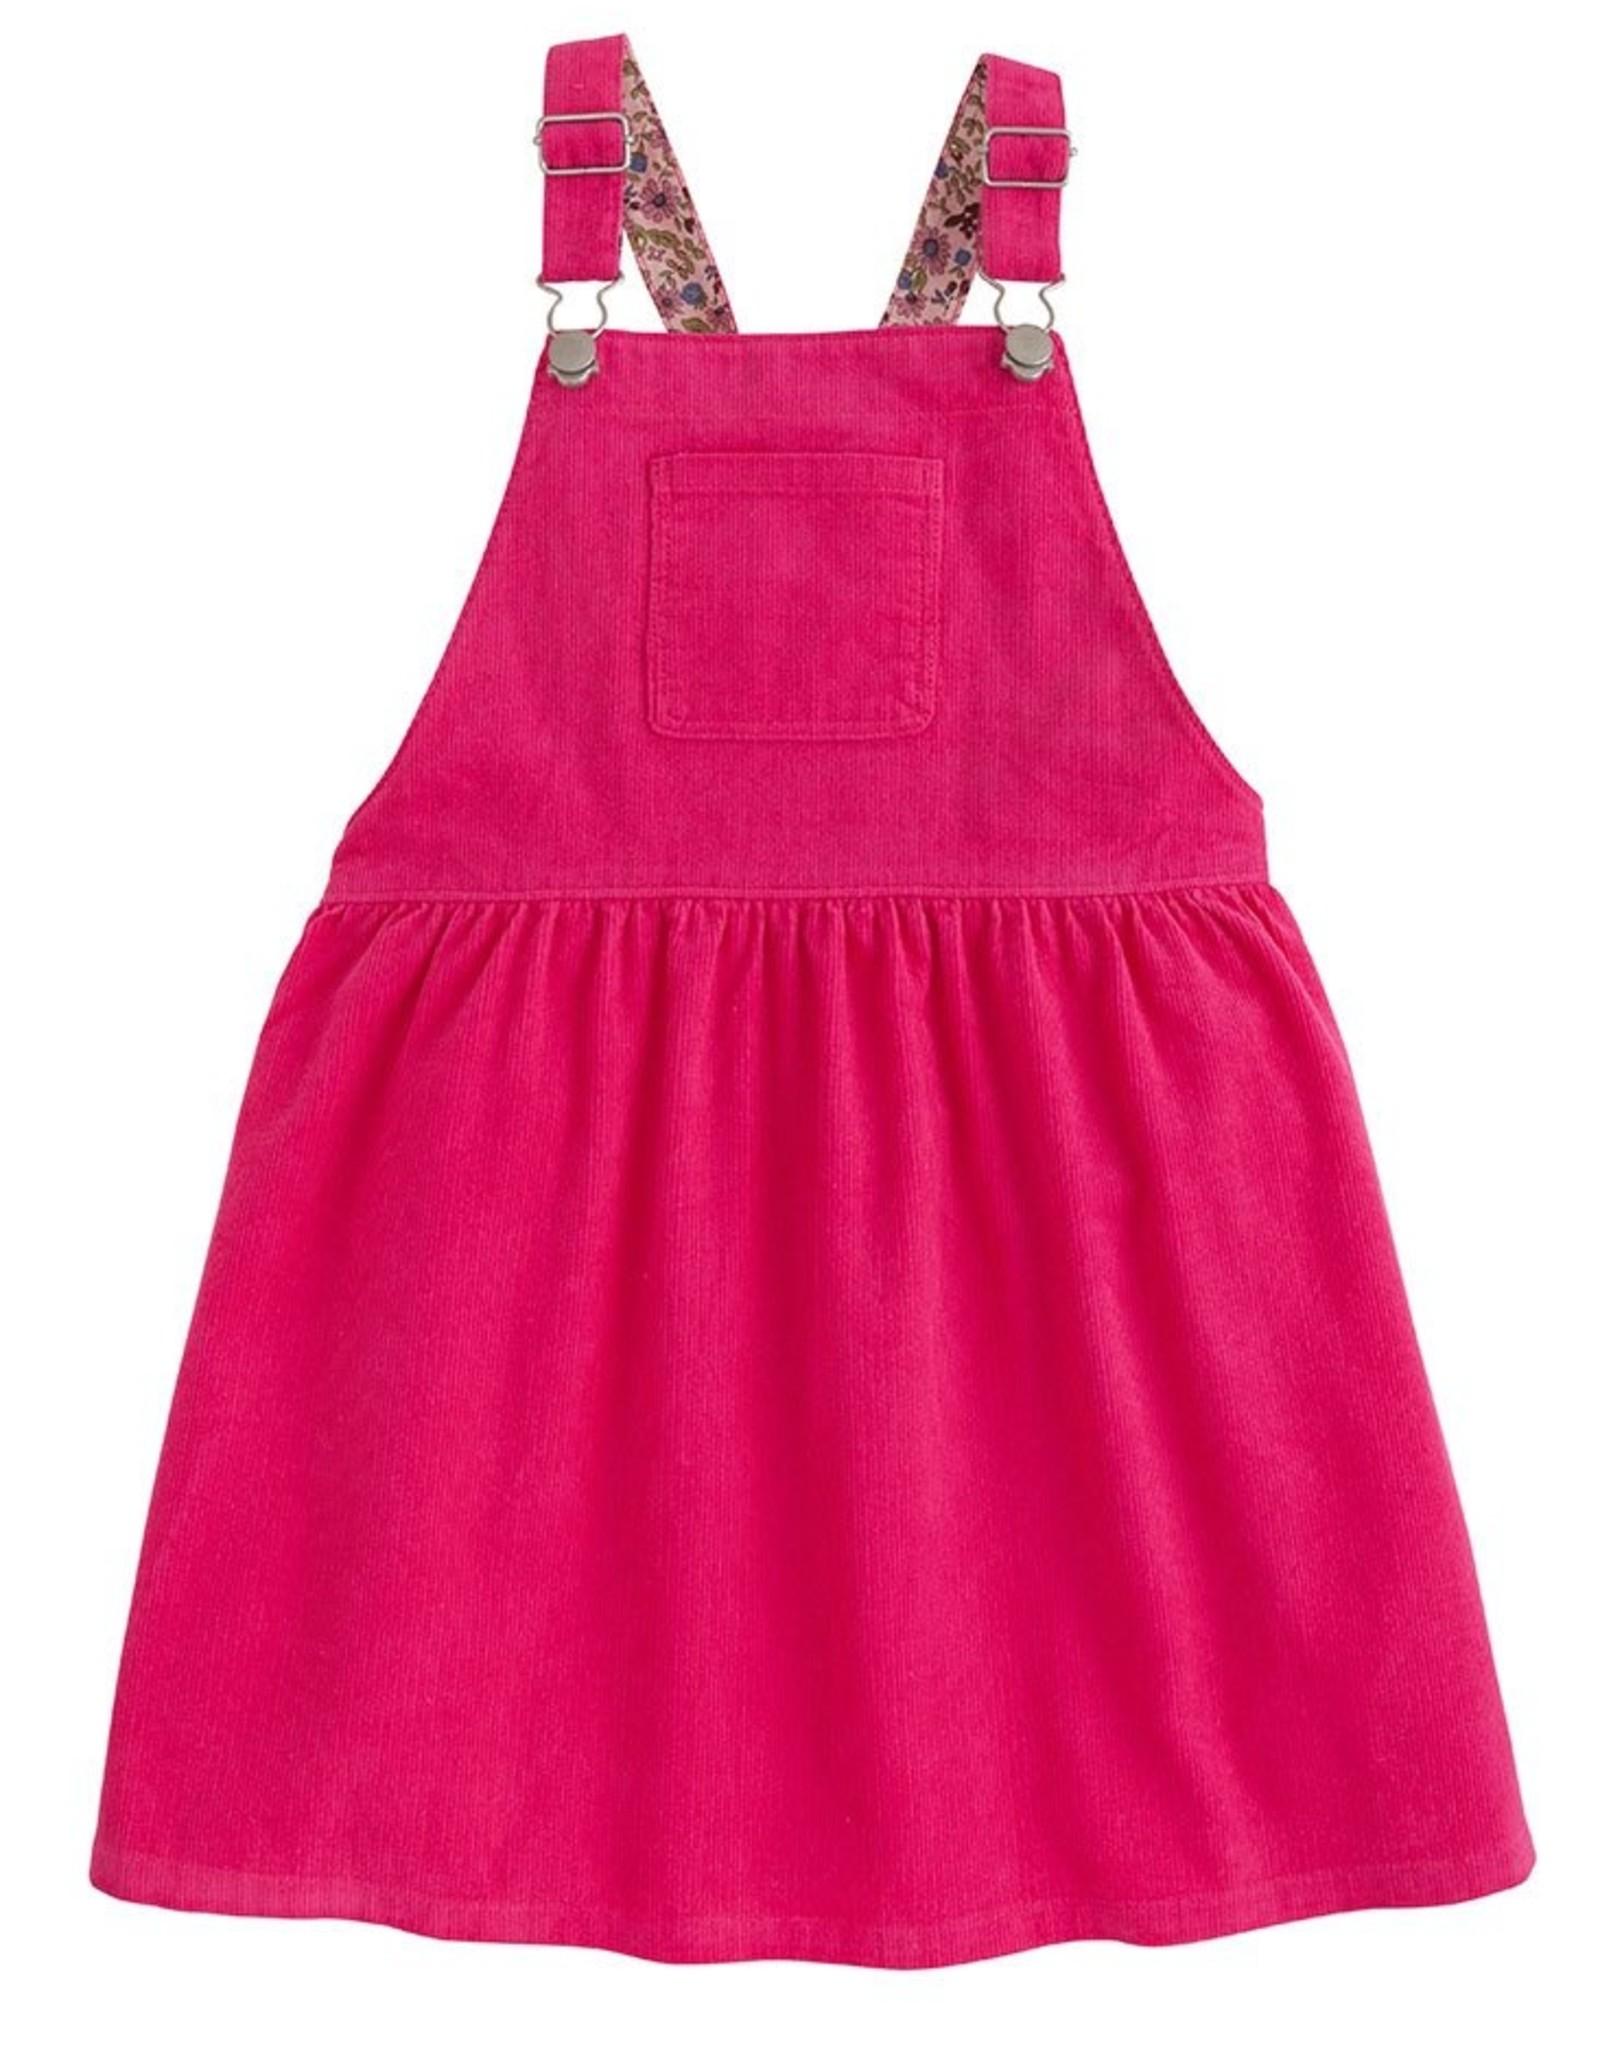 Bisby Hot Pink Cord Pippa Pinnafore